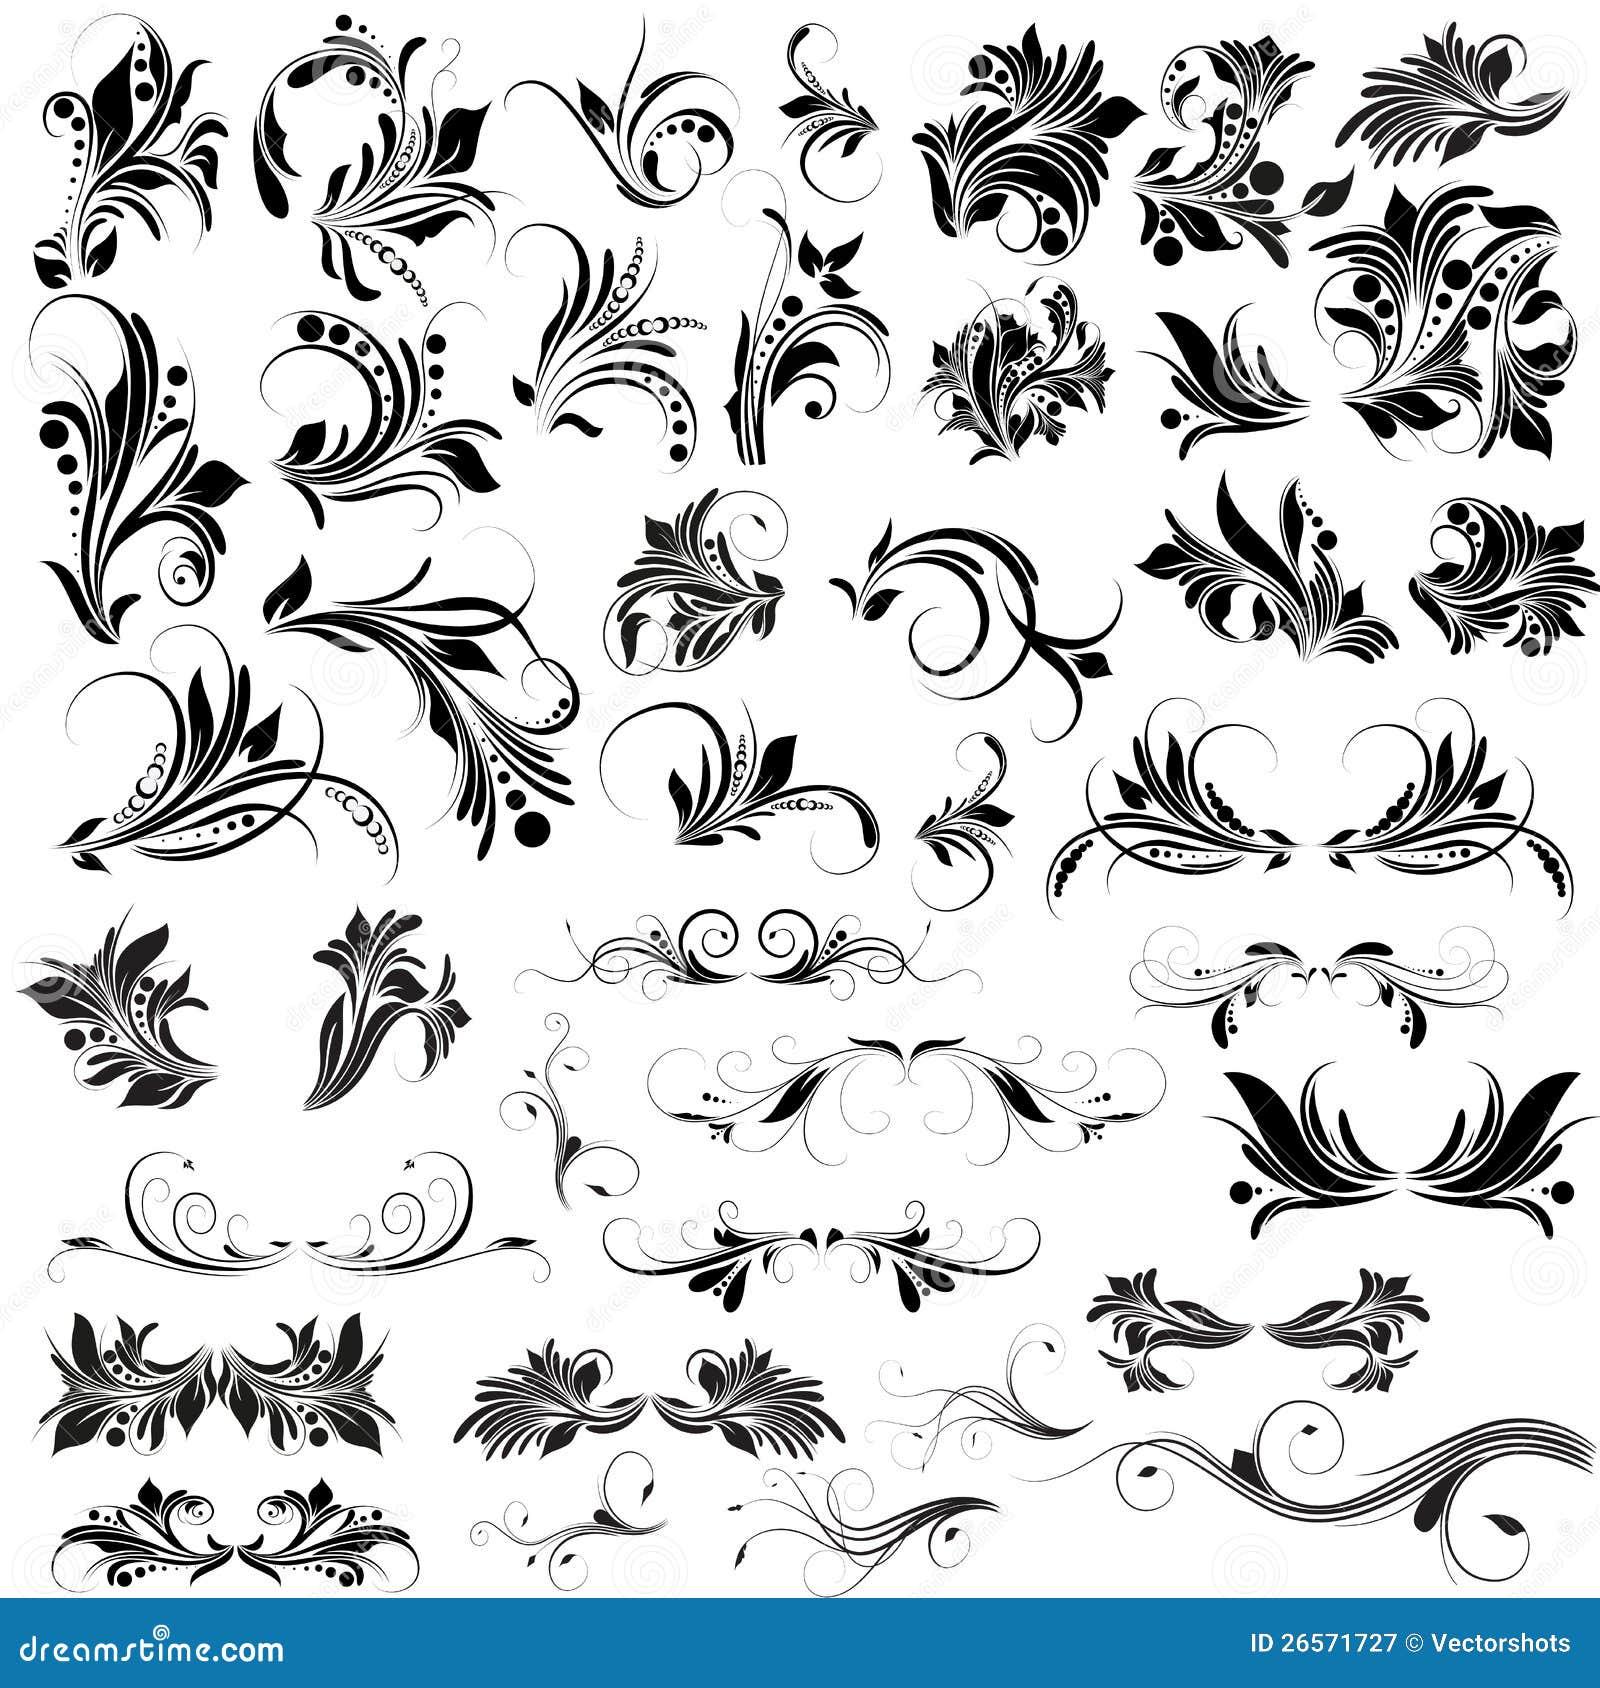 free vector clipart flourishes - photo #46